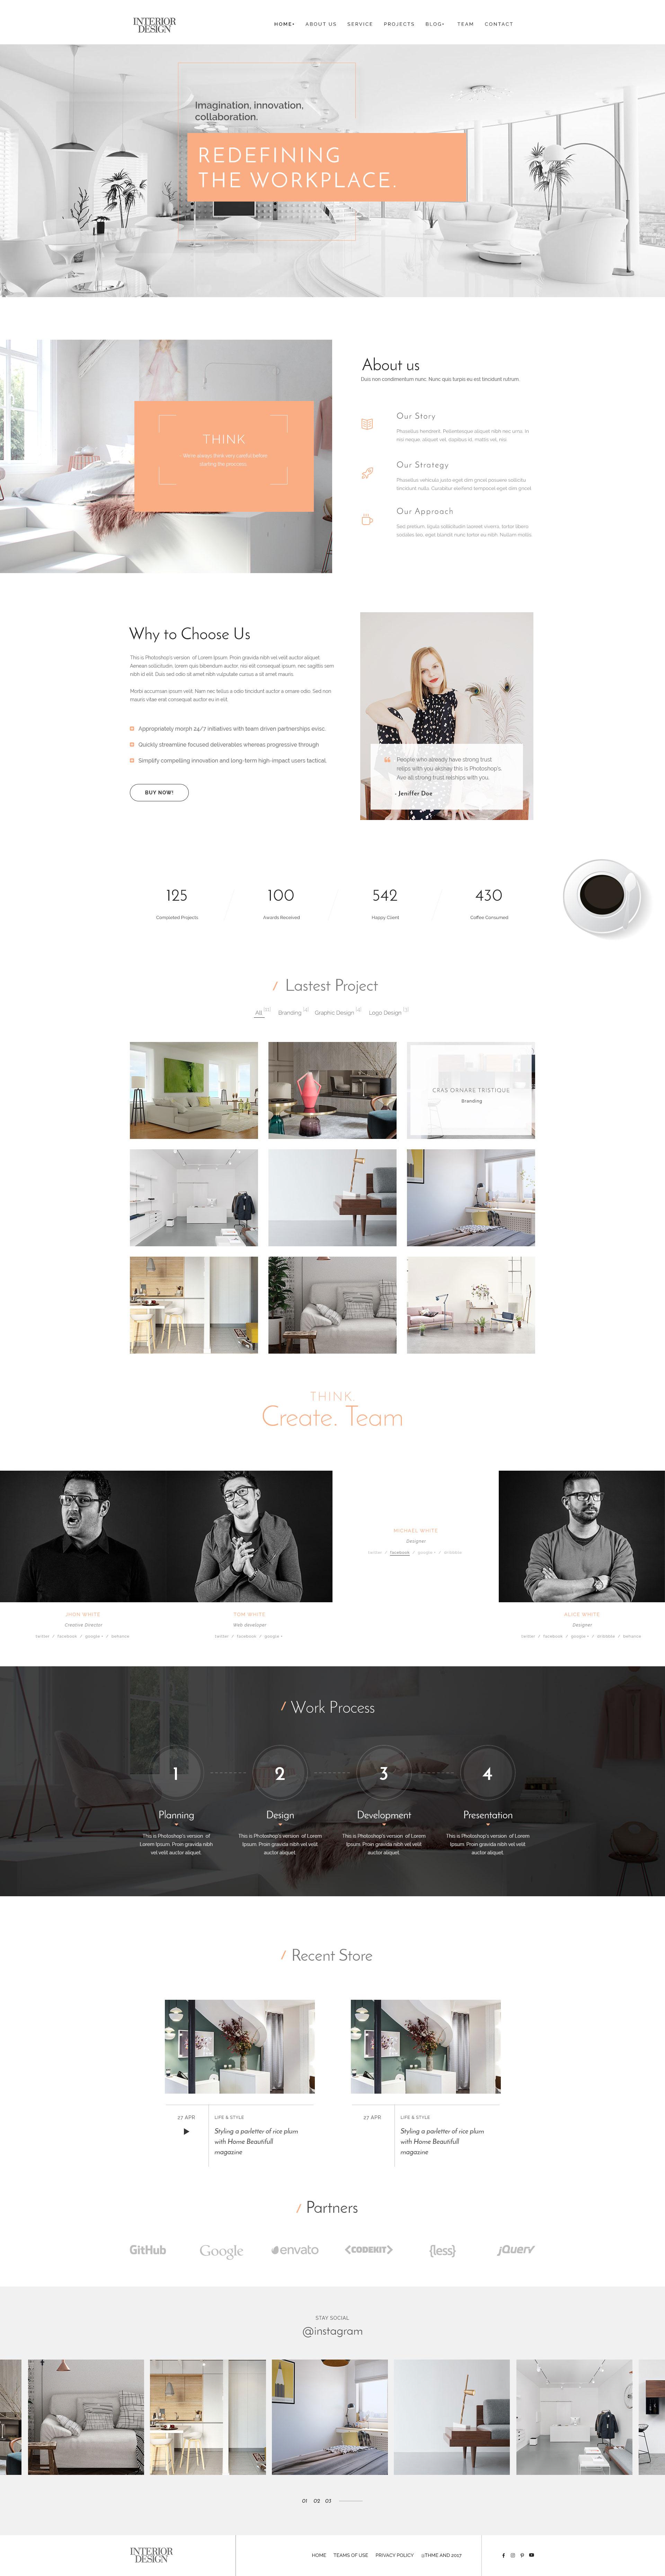 Interior Design - HTML5 Template for Interior Designer - 3